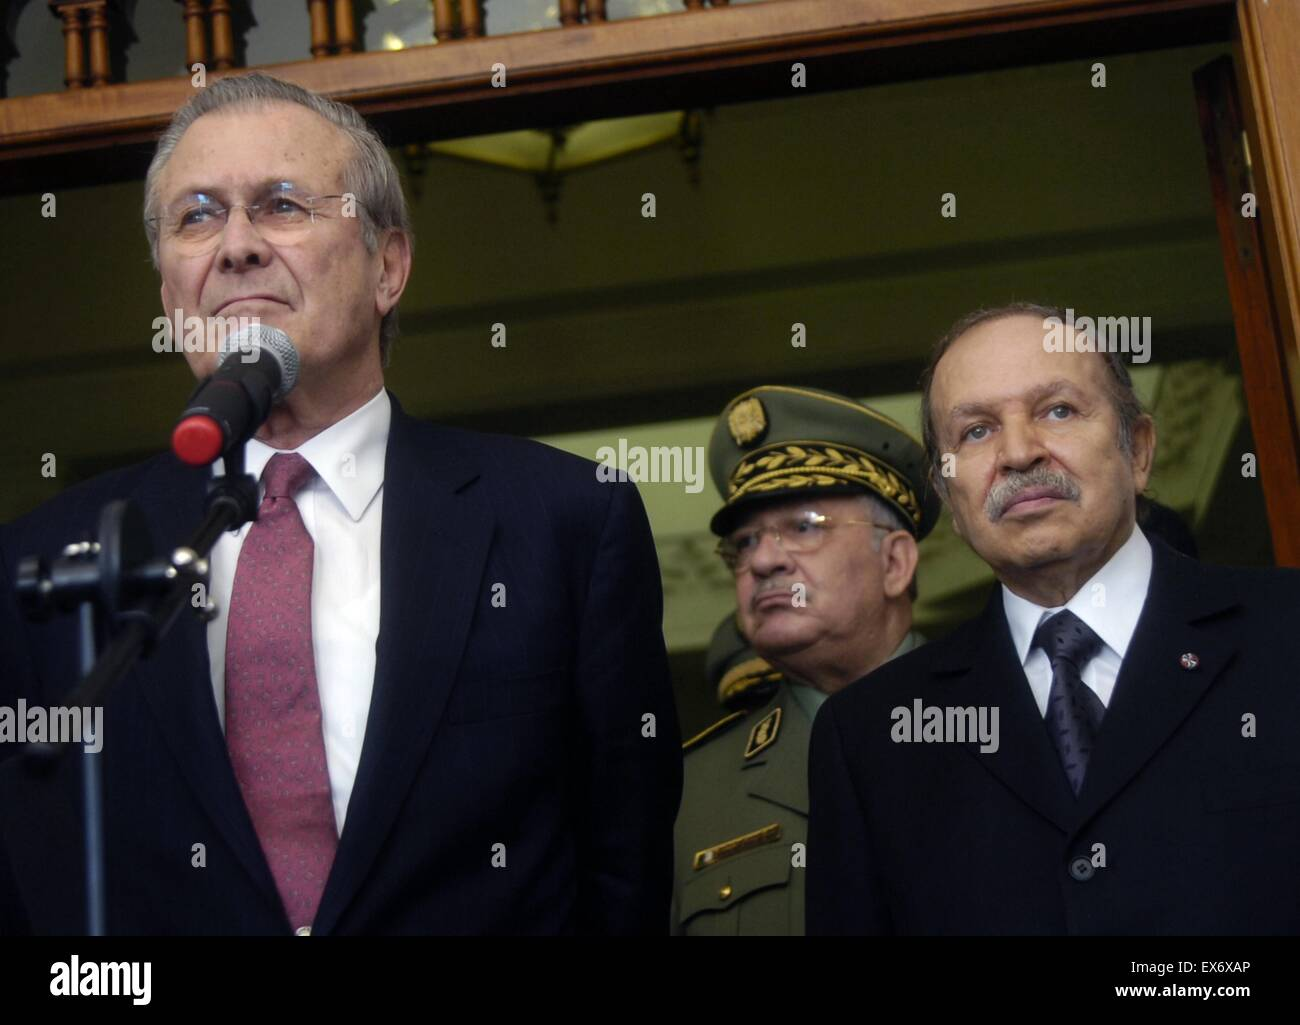 Secretary of Defence Donald H. Rumsfeld and Algerian President Abdul-Aziz Bouteflika 2006 - Stock Image